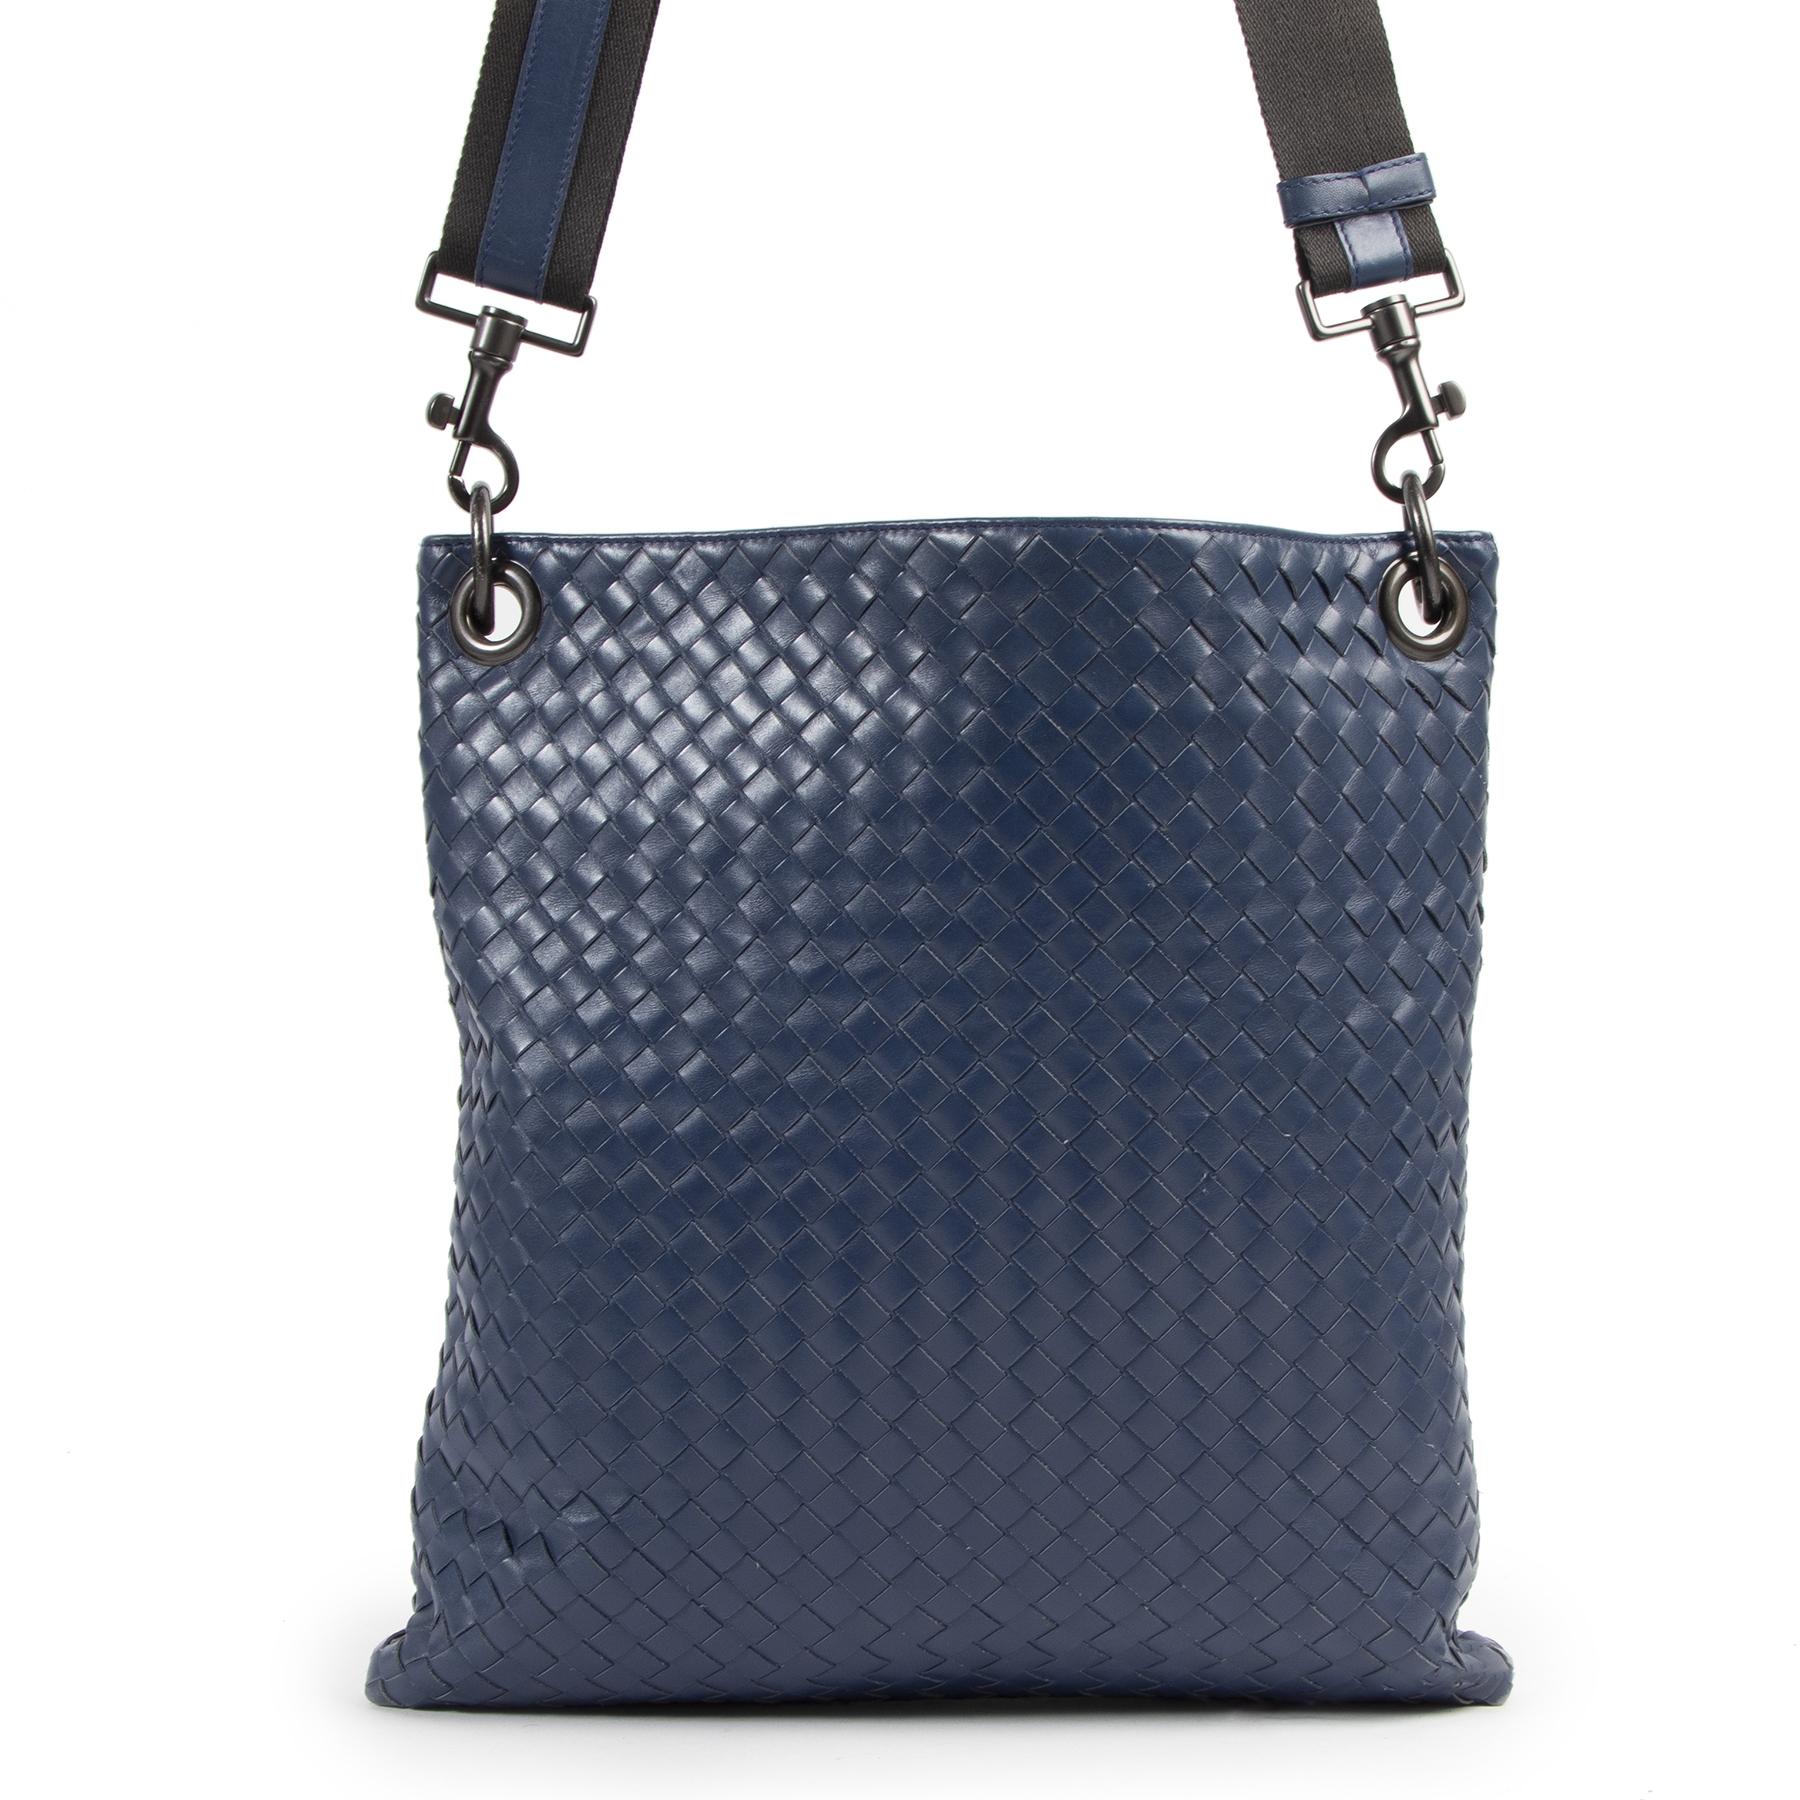 Authentic secondhand Bottega Veneta Blue Intrecciato Woven Nappa Leather Messenger Bag designer bags fashion luxury vintage webshop safe secure online shopping